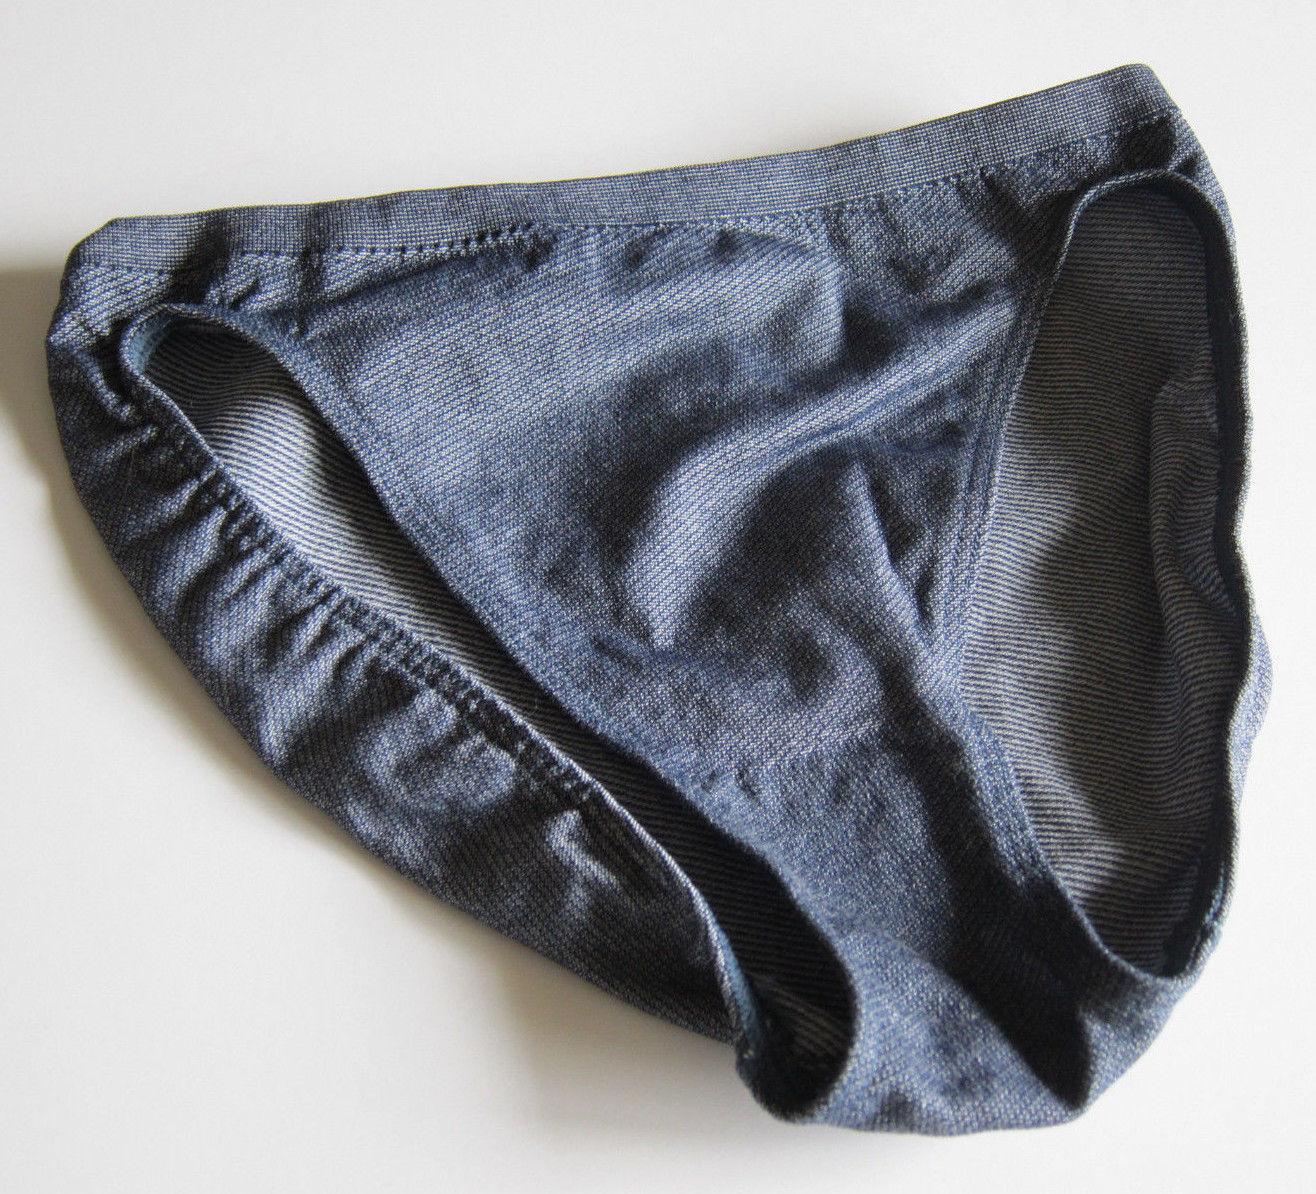 37f81edad459 NWT VINTAGE Victoria's Secret Super Soft Ribbed Stretch Bikini Panties SZ  Small - $17.81